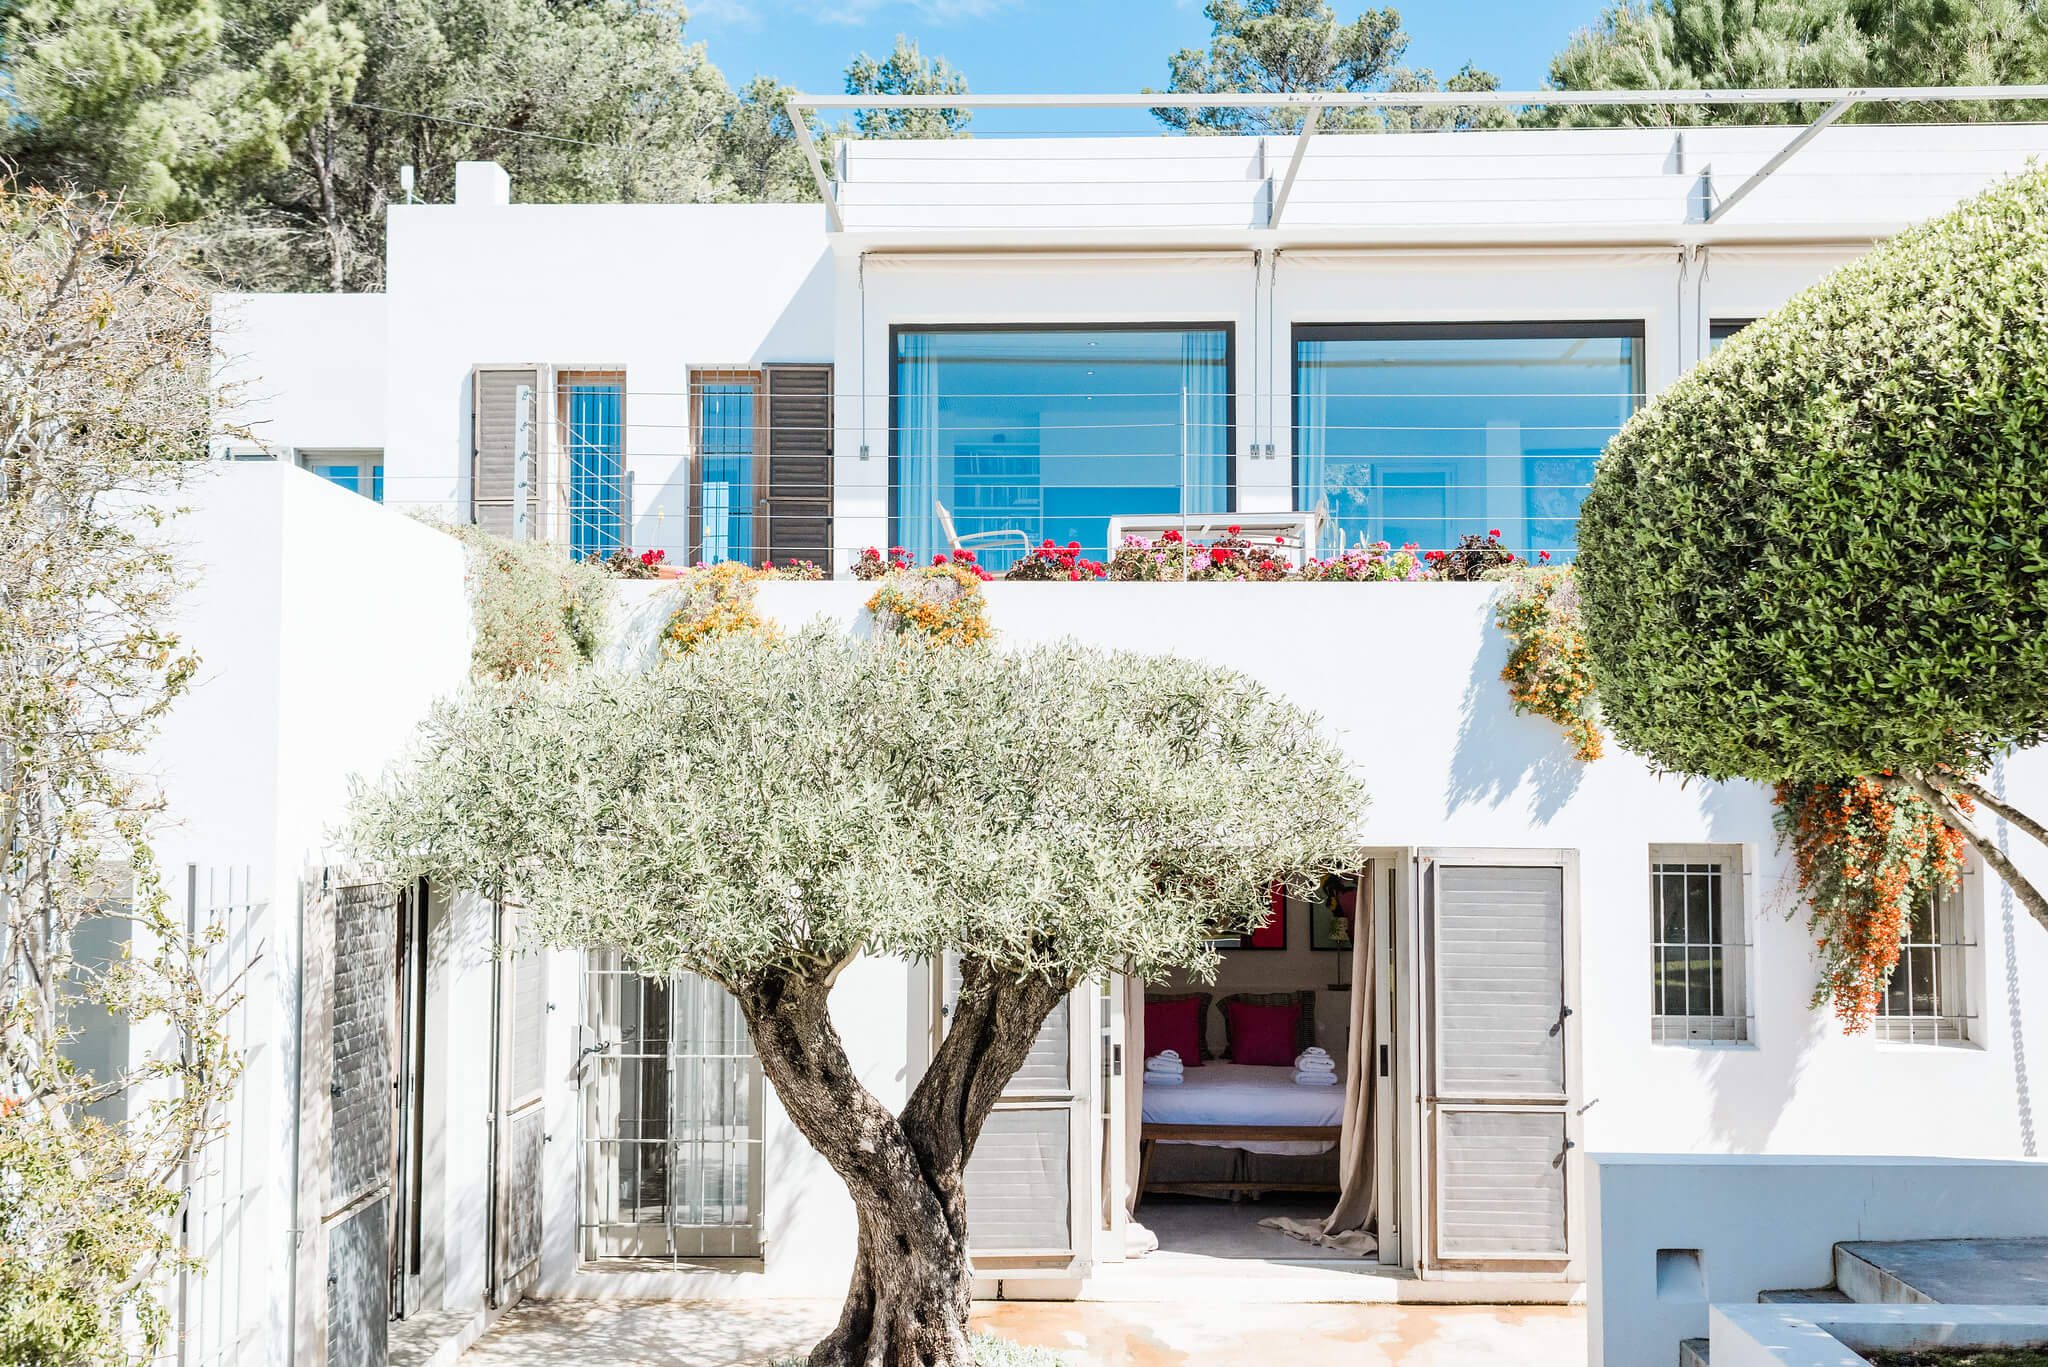 https://www.white-ibiza.com/wp-content/uploads/2020/06/white-ibiza-villas-casa-nyah-exterior-house.jpg